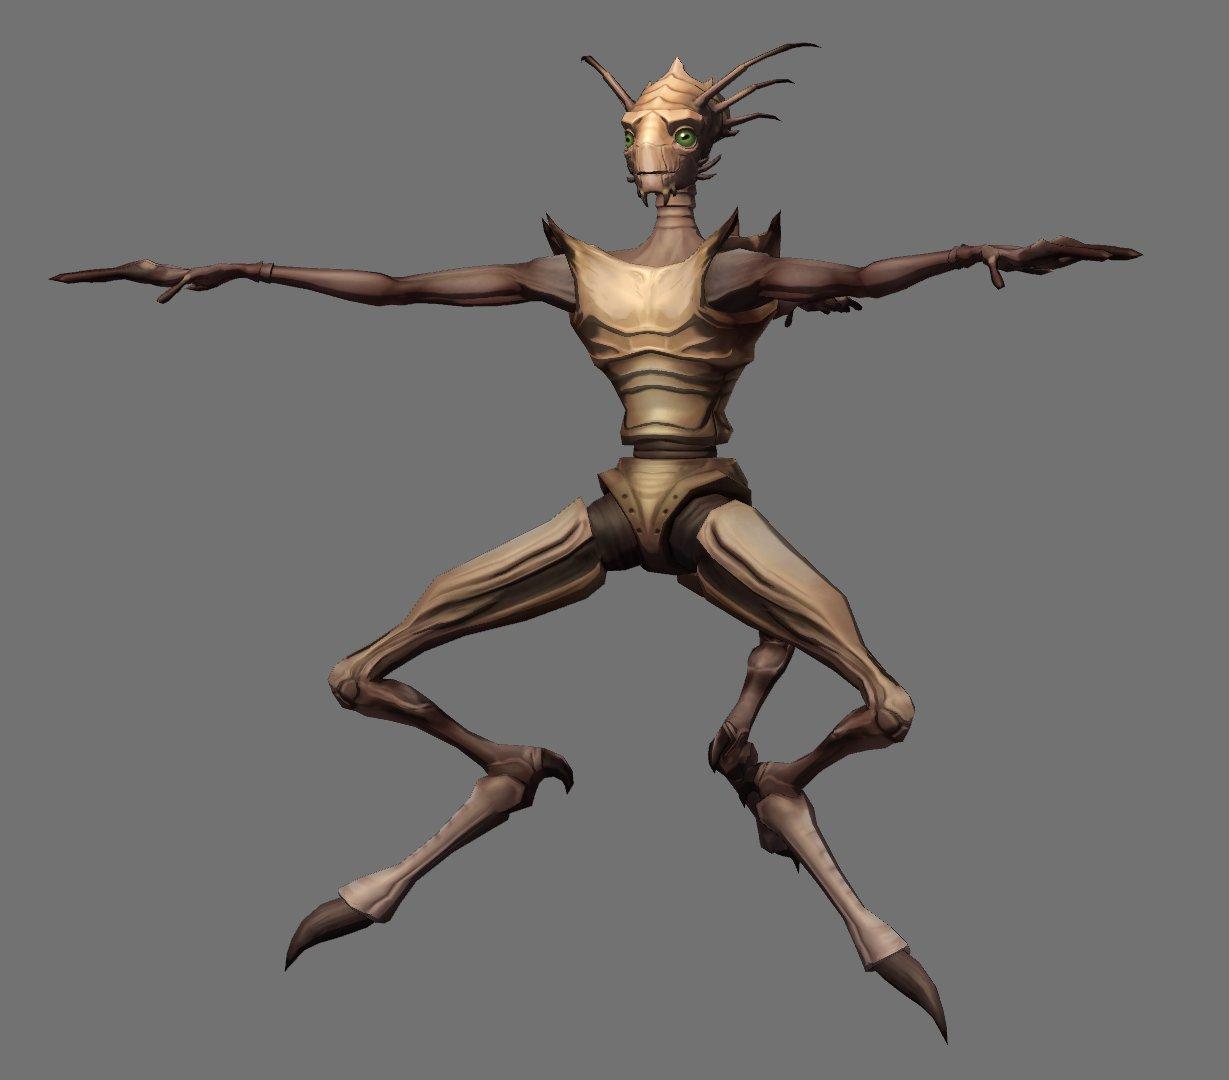 Jonathan lauer alienfront1